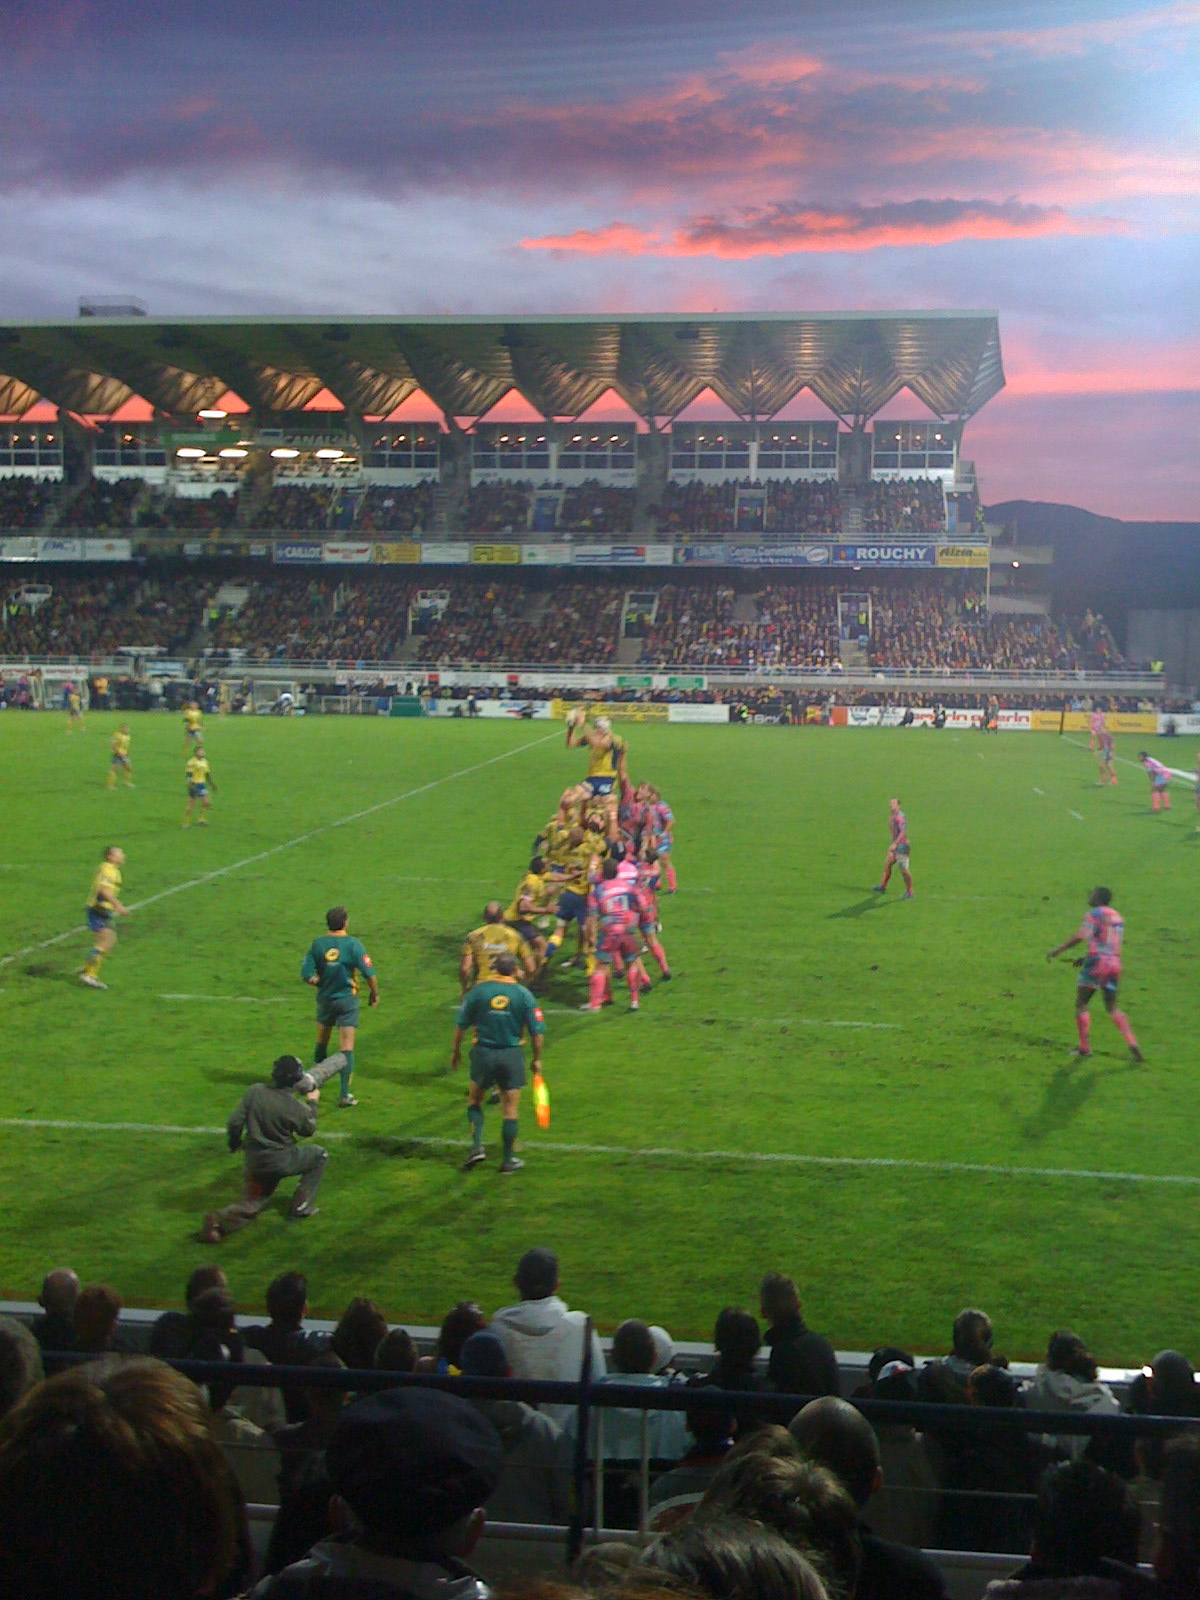 ASM - SF saison 2008-09 - Stade Marcel-Michelin